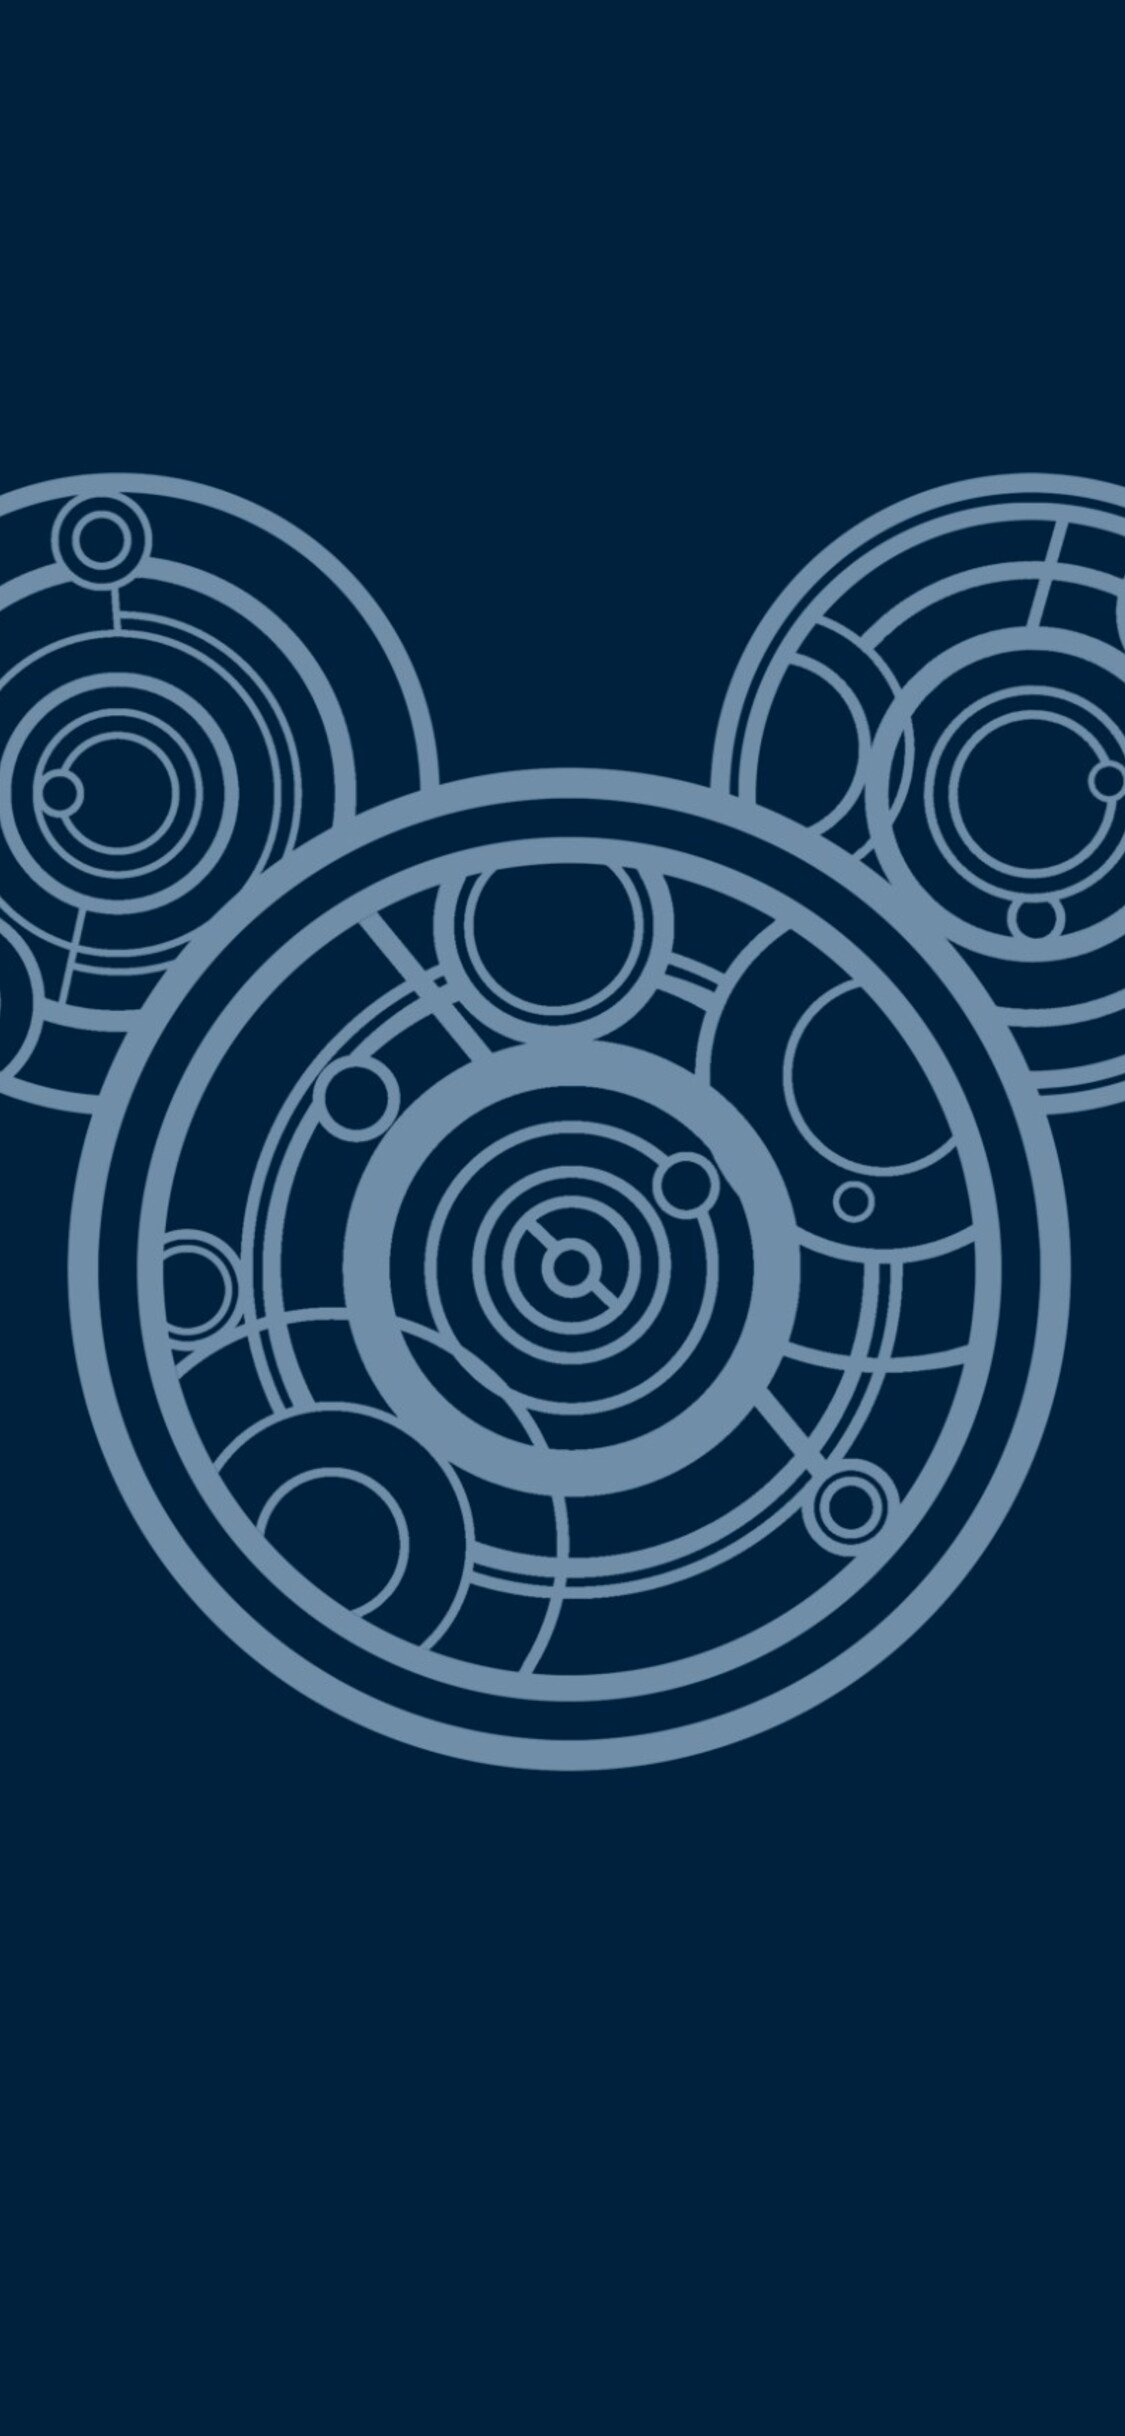 mickey-mouse-minimalism-image.jpg